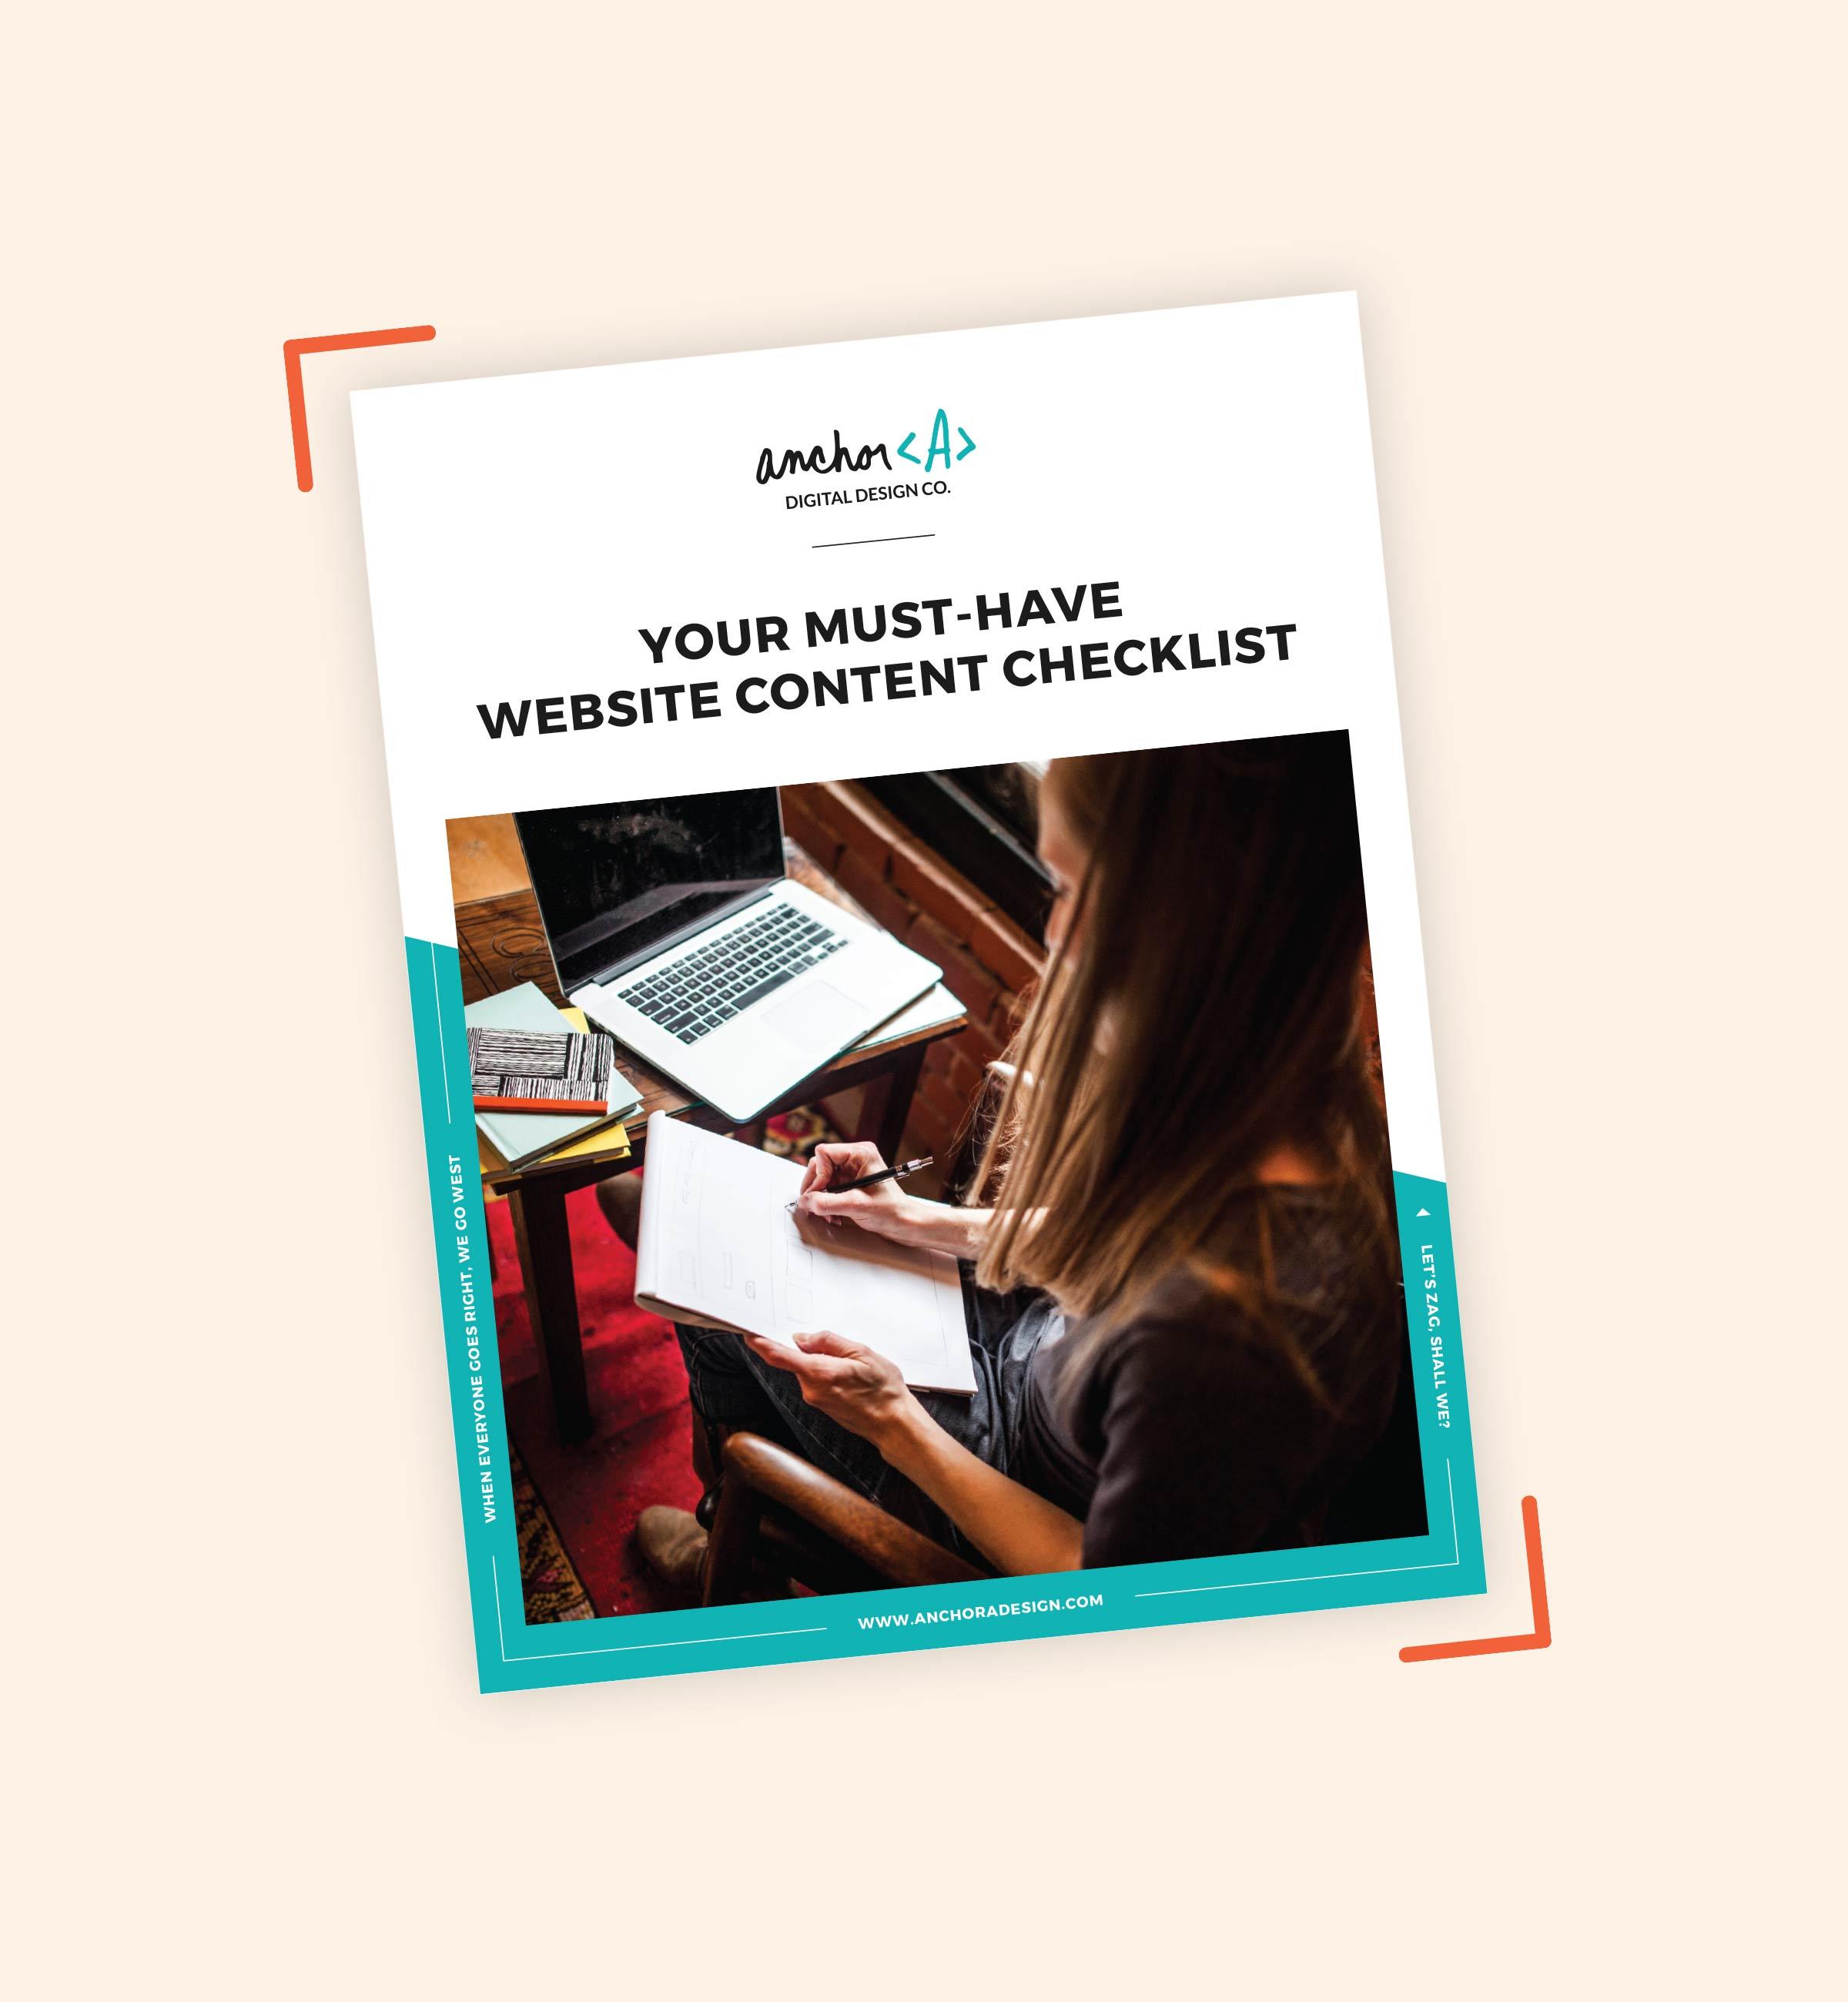 Freebie: Your Must-Have Website Content Checklist